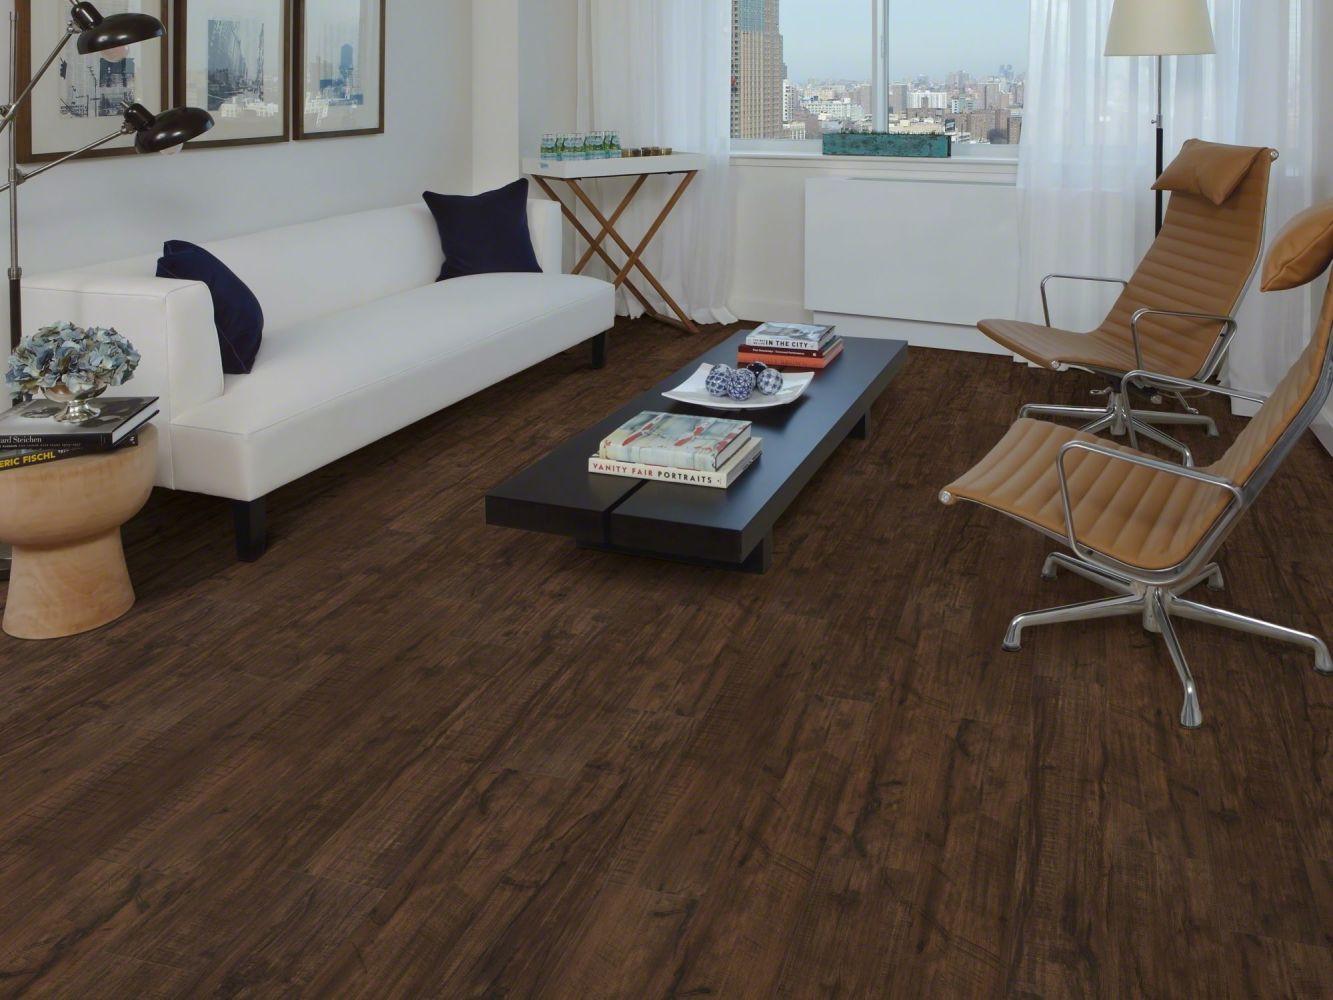 Shaw Floors Dr Horton Ballantyne Plus Click Umber Oak 00734_DR036